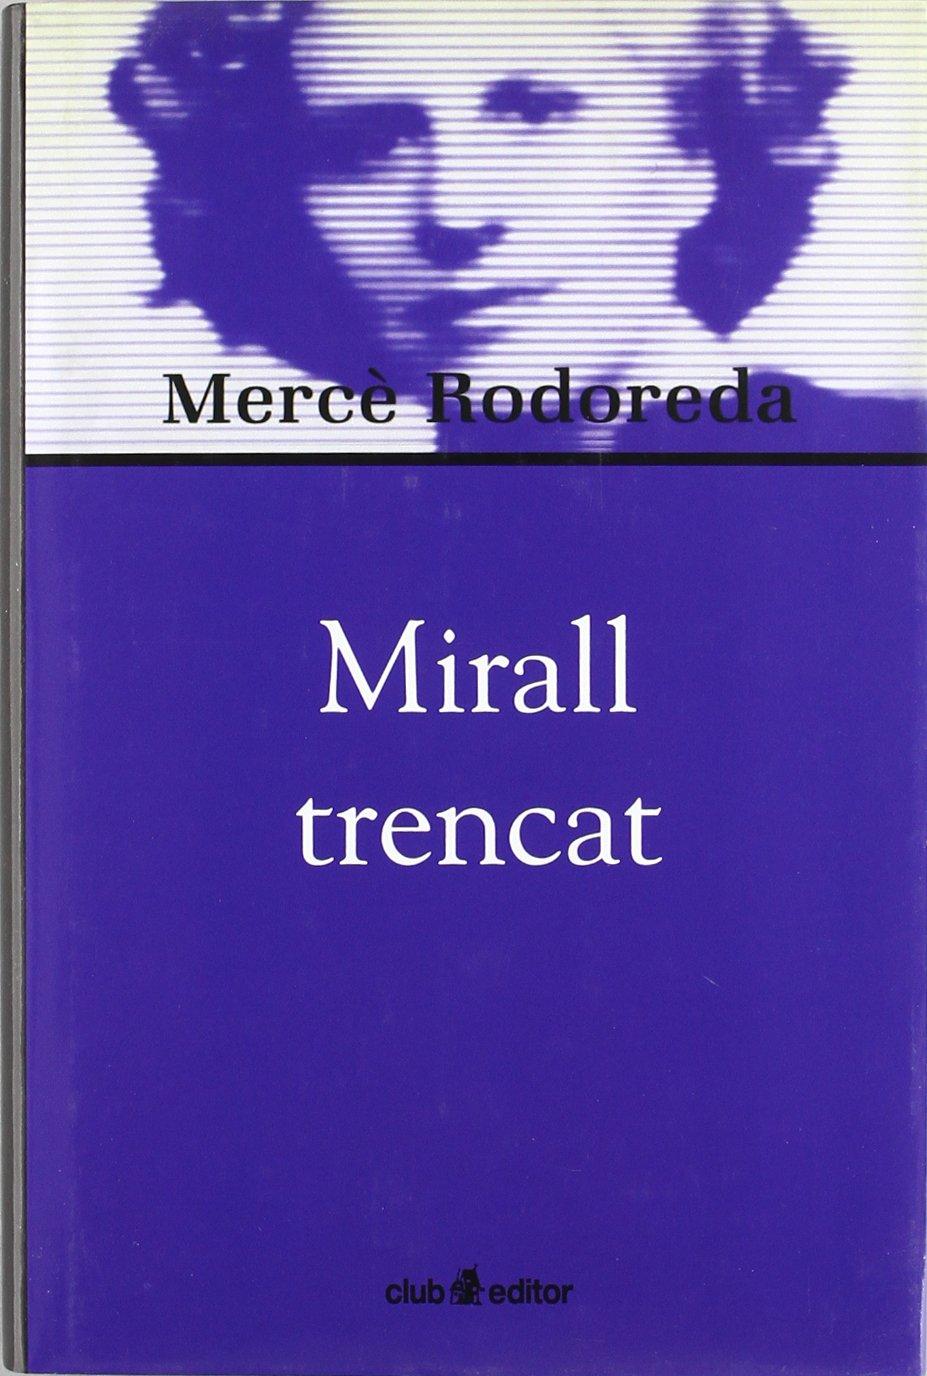 Mirall trencat (Biblioteca Mercè Rodoreda): Amazon.es: Rodoreda ...